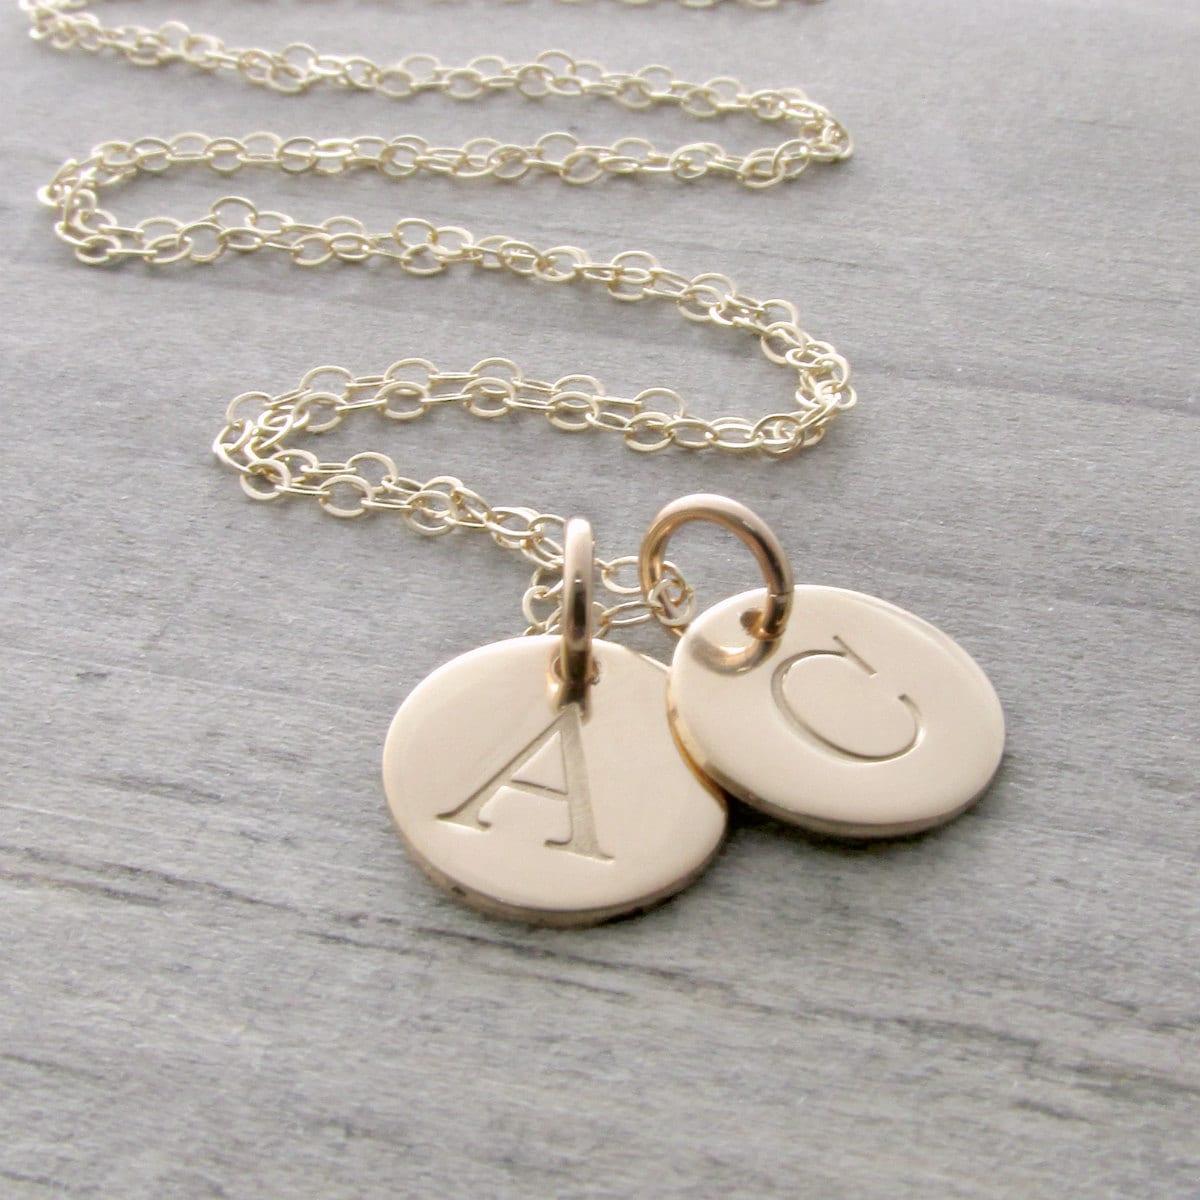 solid gold initial necklace gold necklace gold pendant. Black Bedroom Furniture Sets. Home Design Ideas